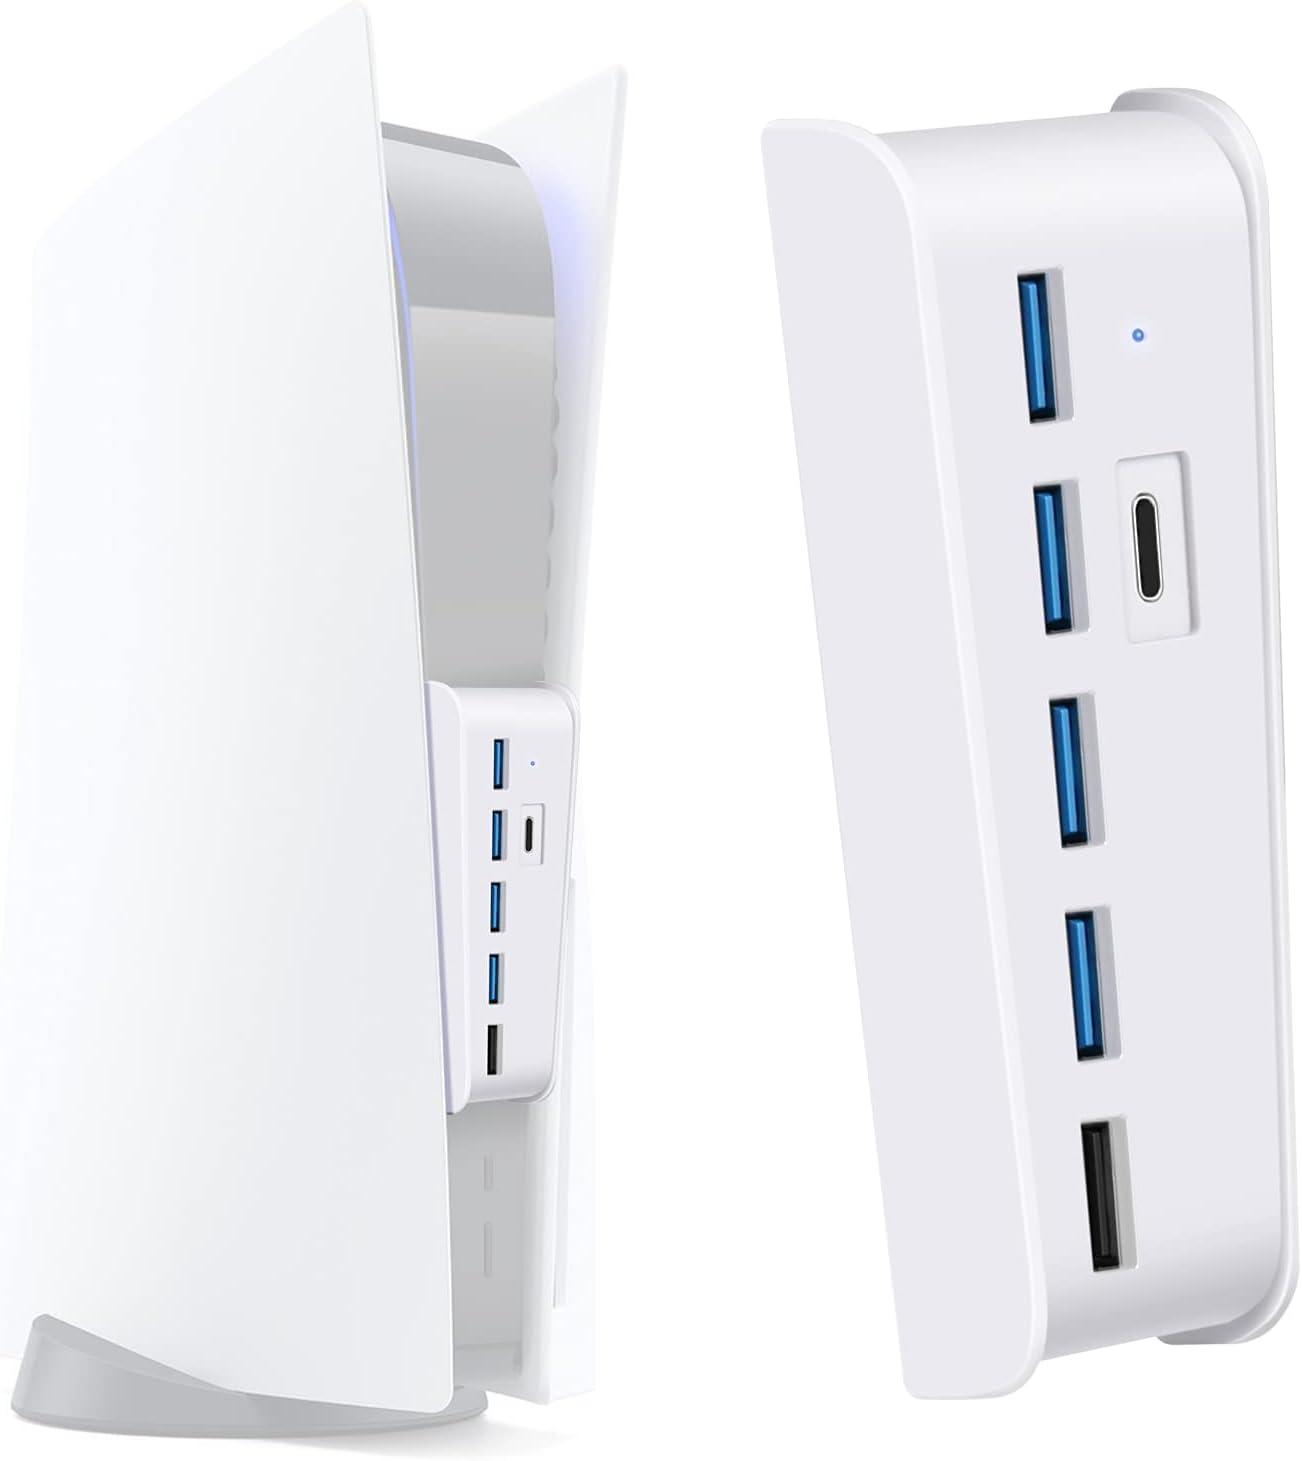 TNP PS5 USB Hub 3.1 Type Extension C Time sale Transmi High-Speed Tampa Mall